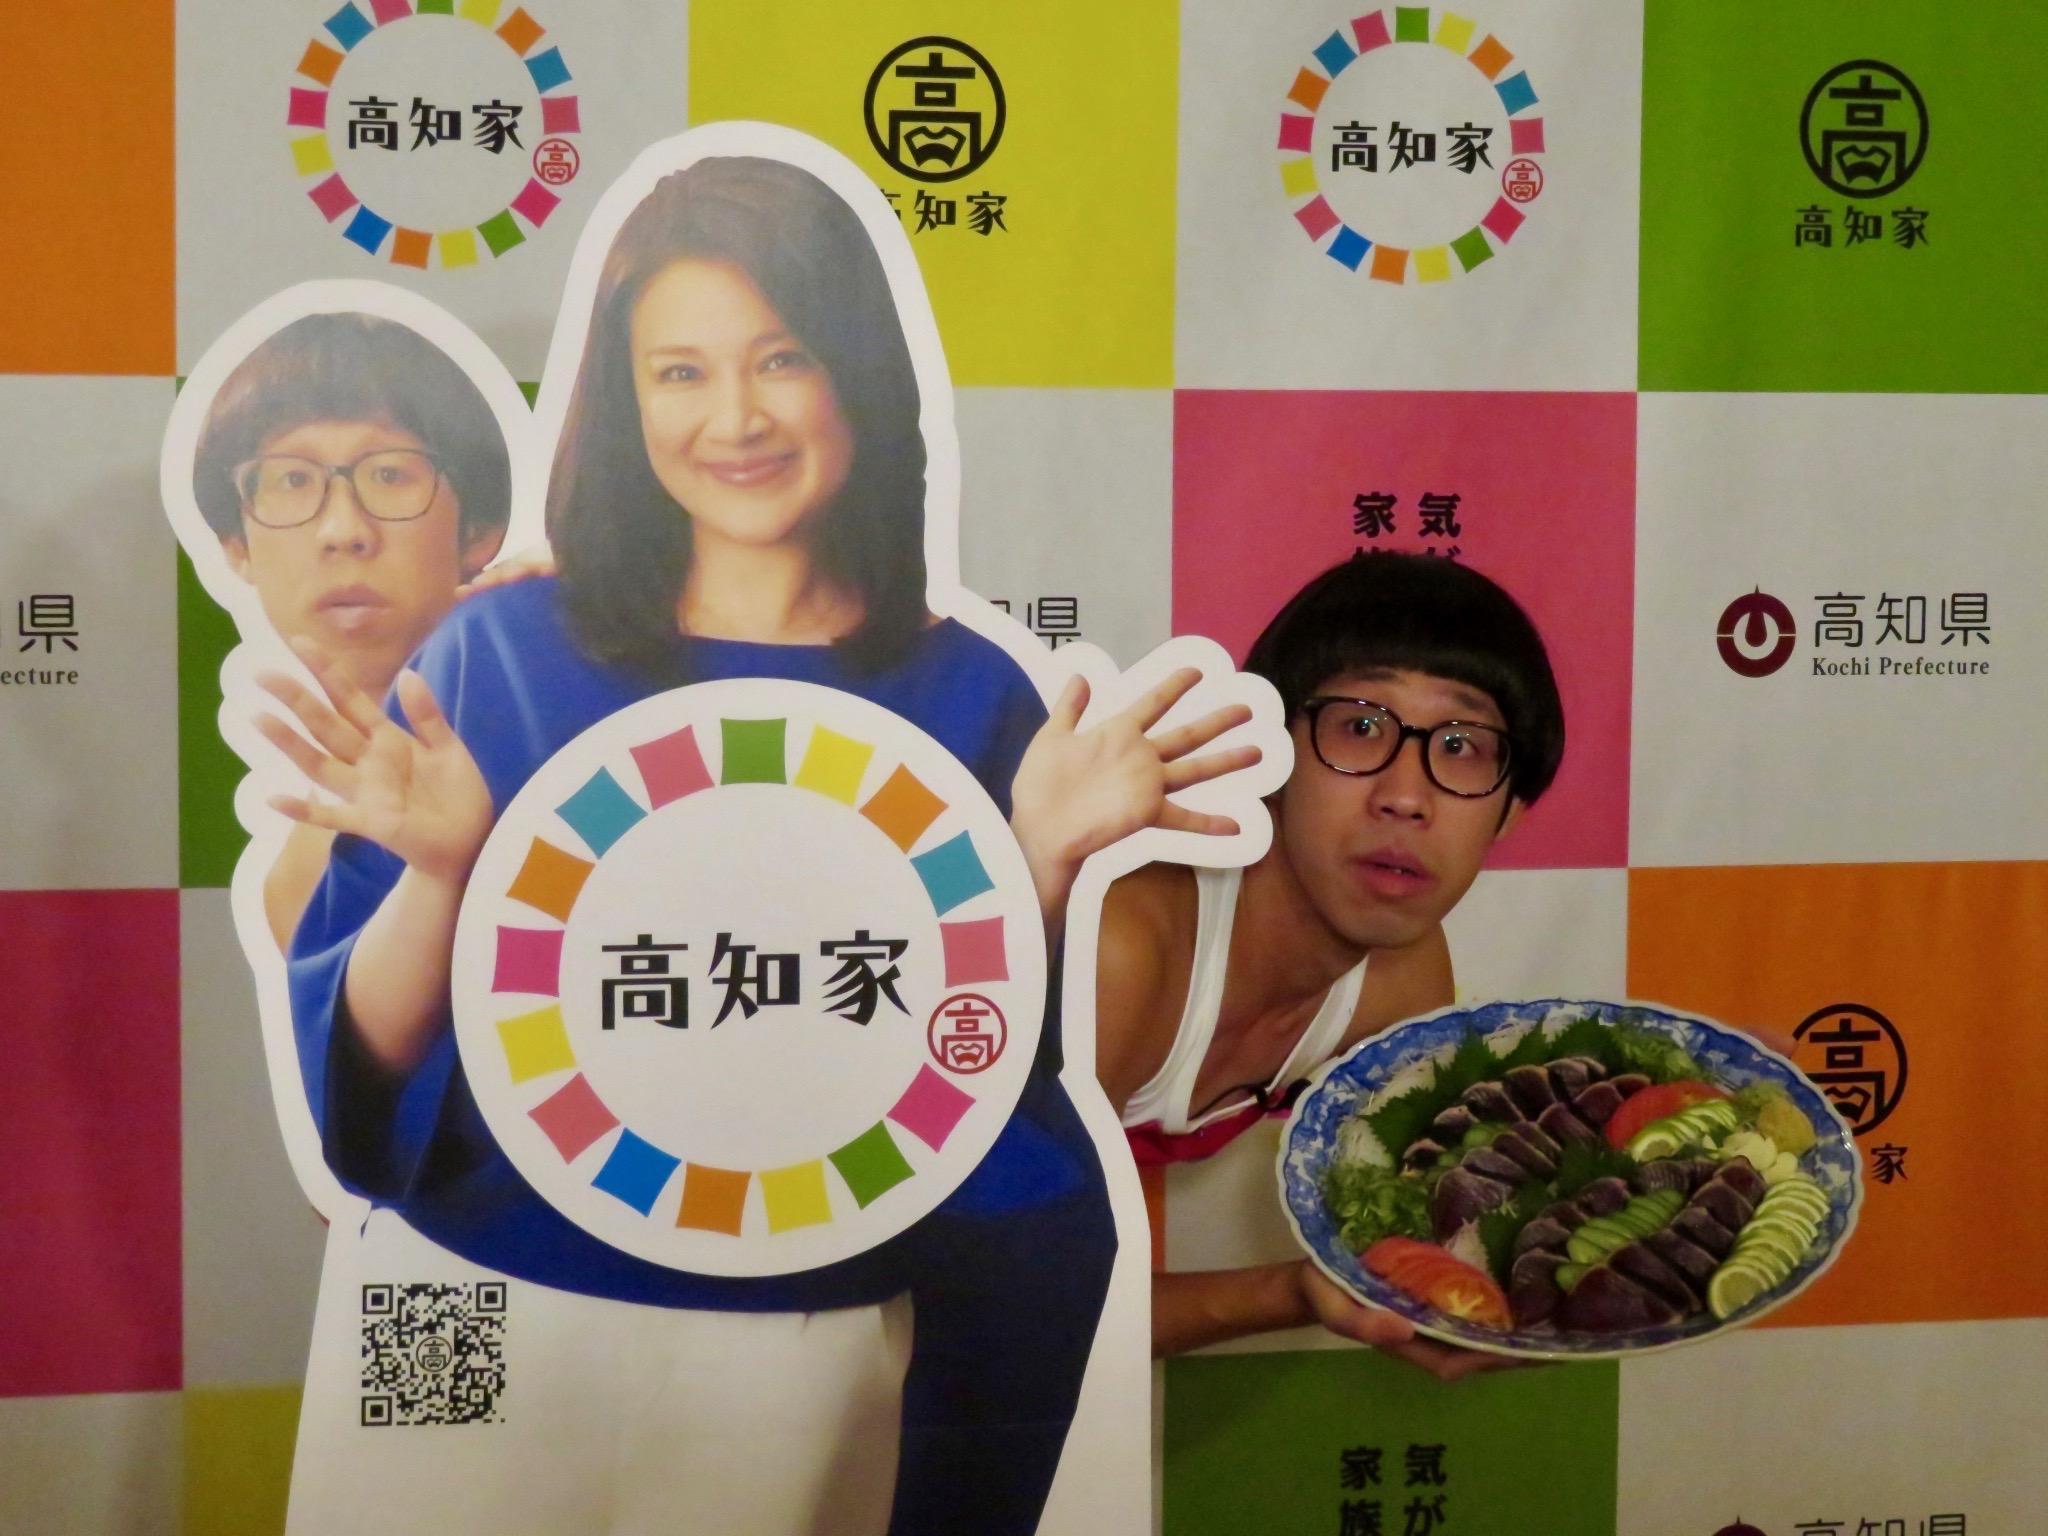 http://news.yoshimoto.co.jp/20180927222500-1e96c516055fafbb1408244722871054d47c66ee.jpg